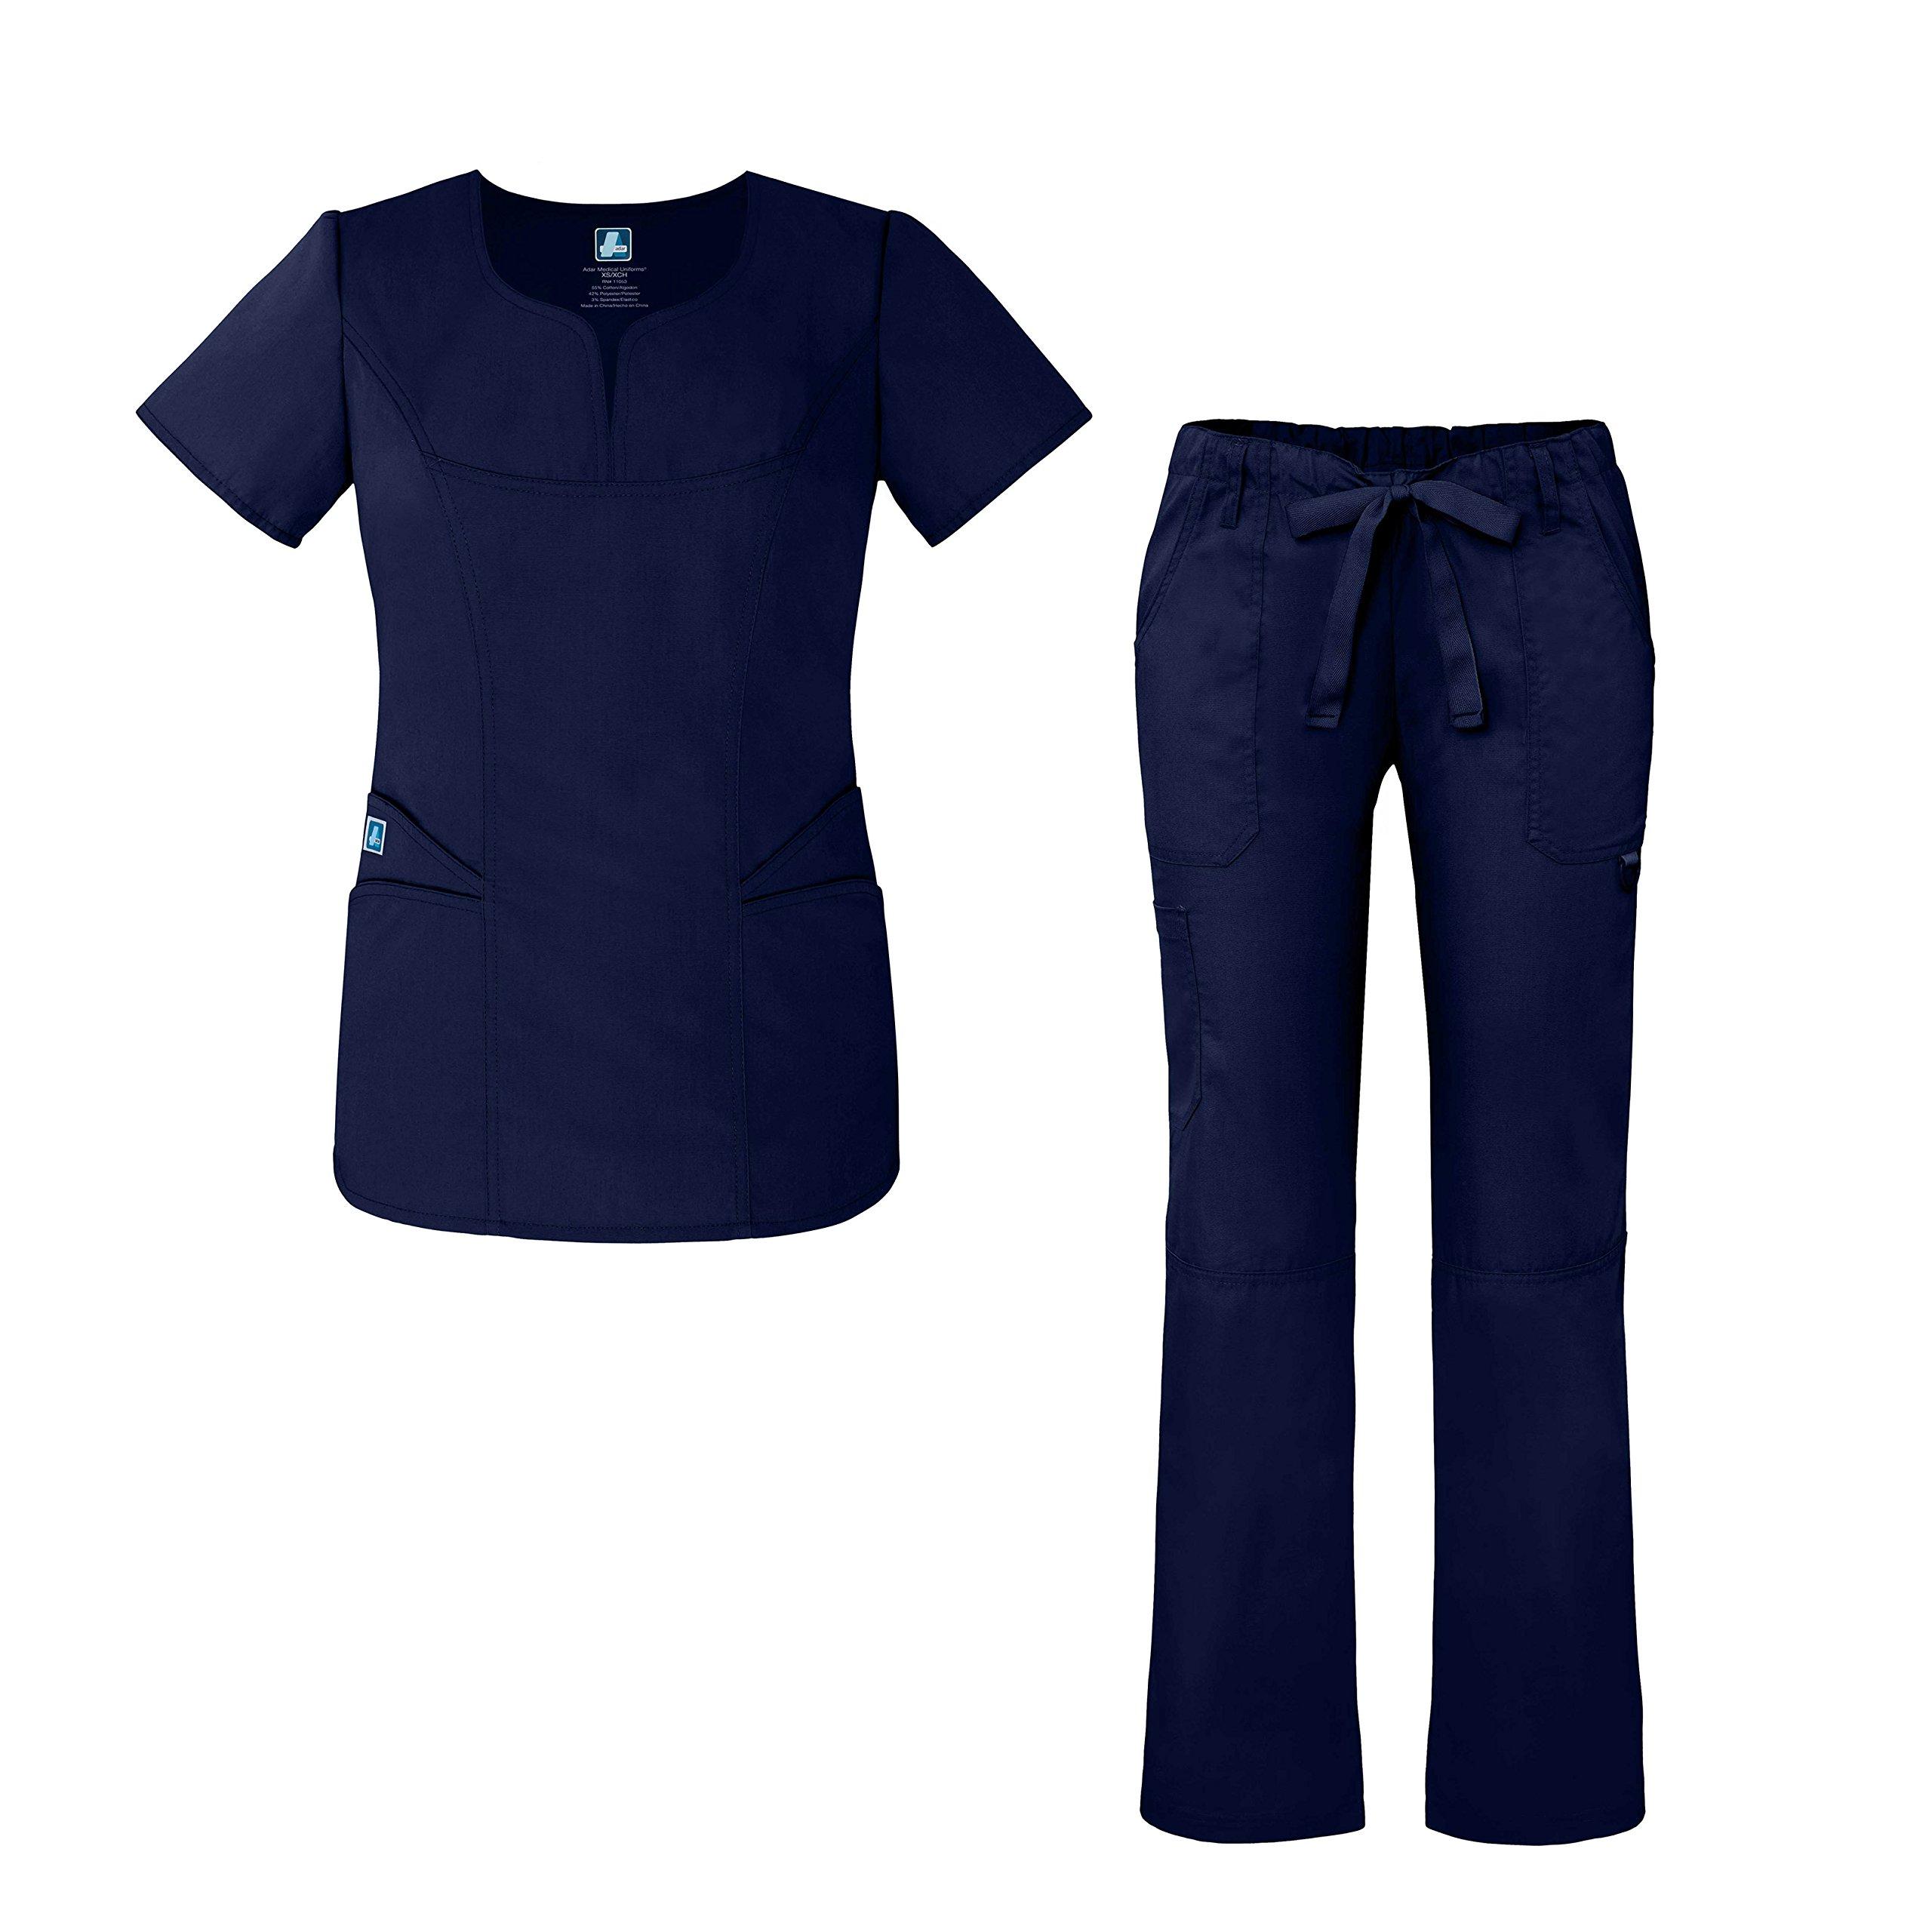 Universal Women's Scrub Set – Fashion Scrub Top and Multi-Pocket Scrub Pants - 903 - Navy - XL